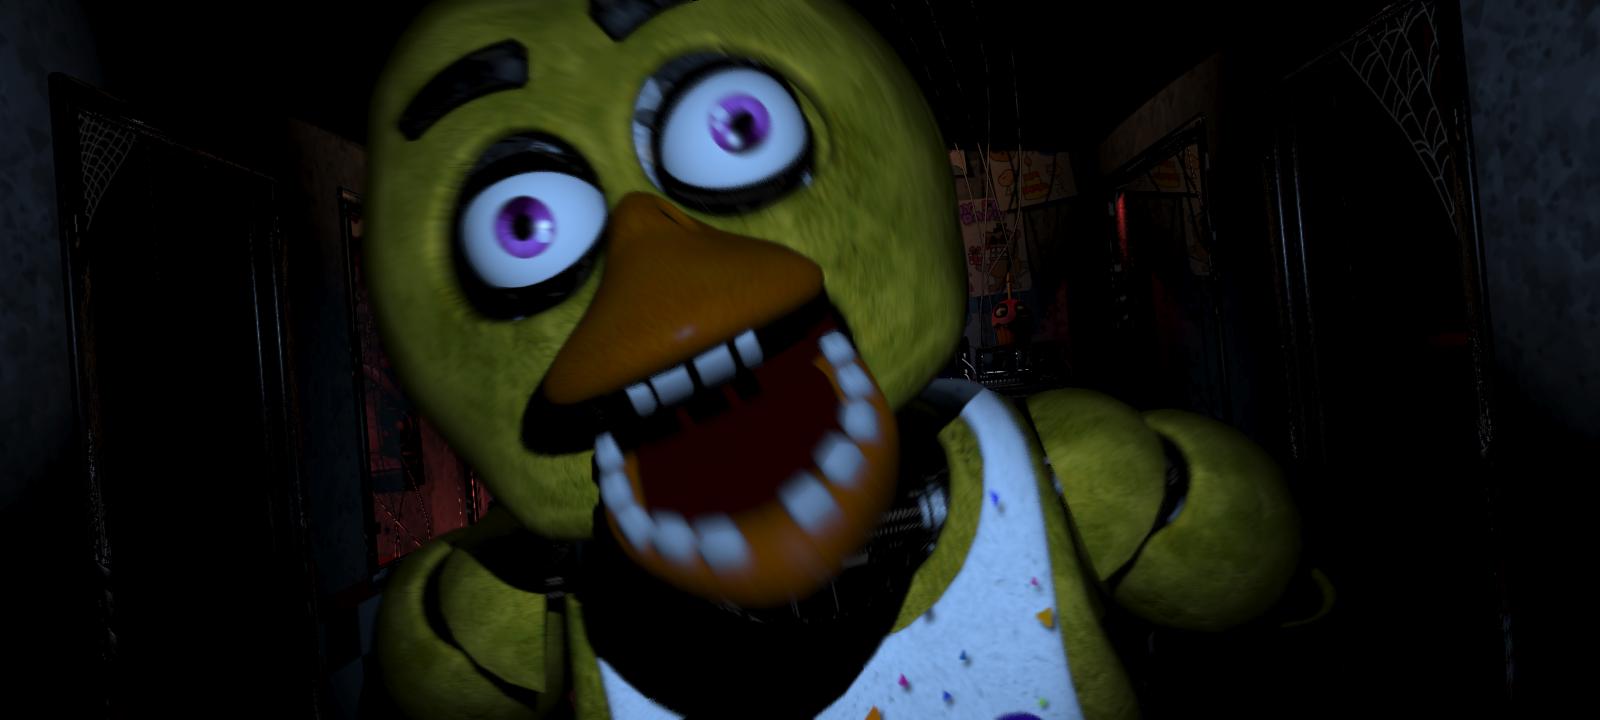 Modojo | Five Creepy Games for Halloween